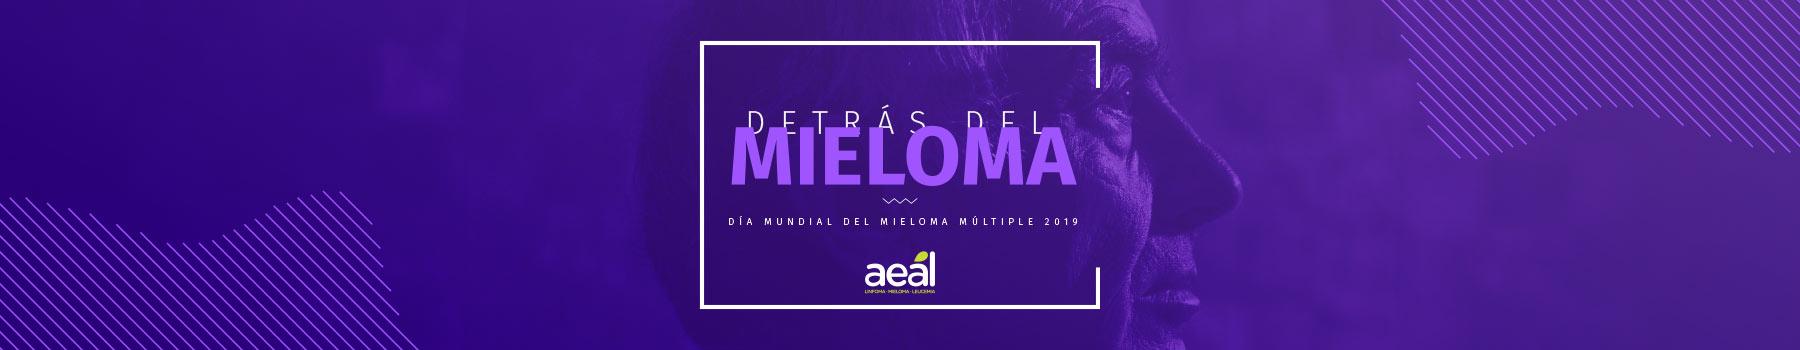 banner-aeal-detras-del-mieloma-aeal-2019